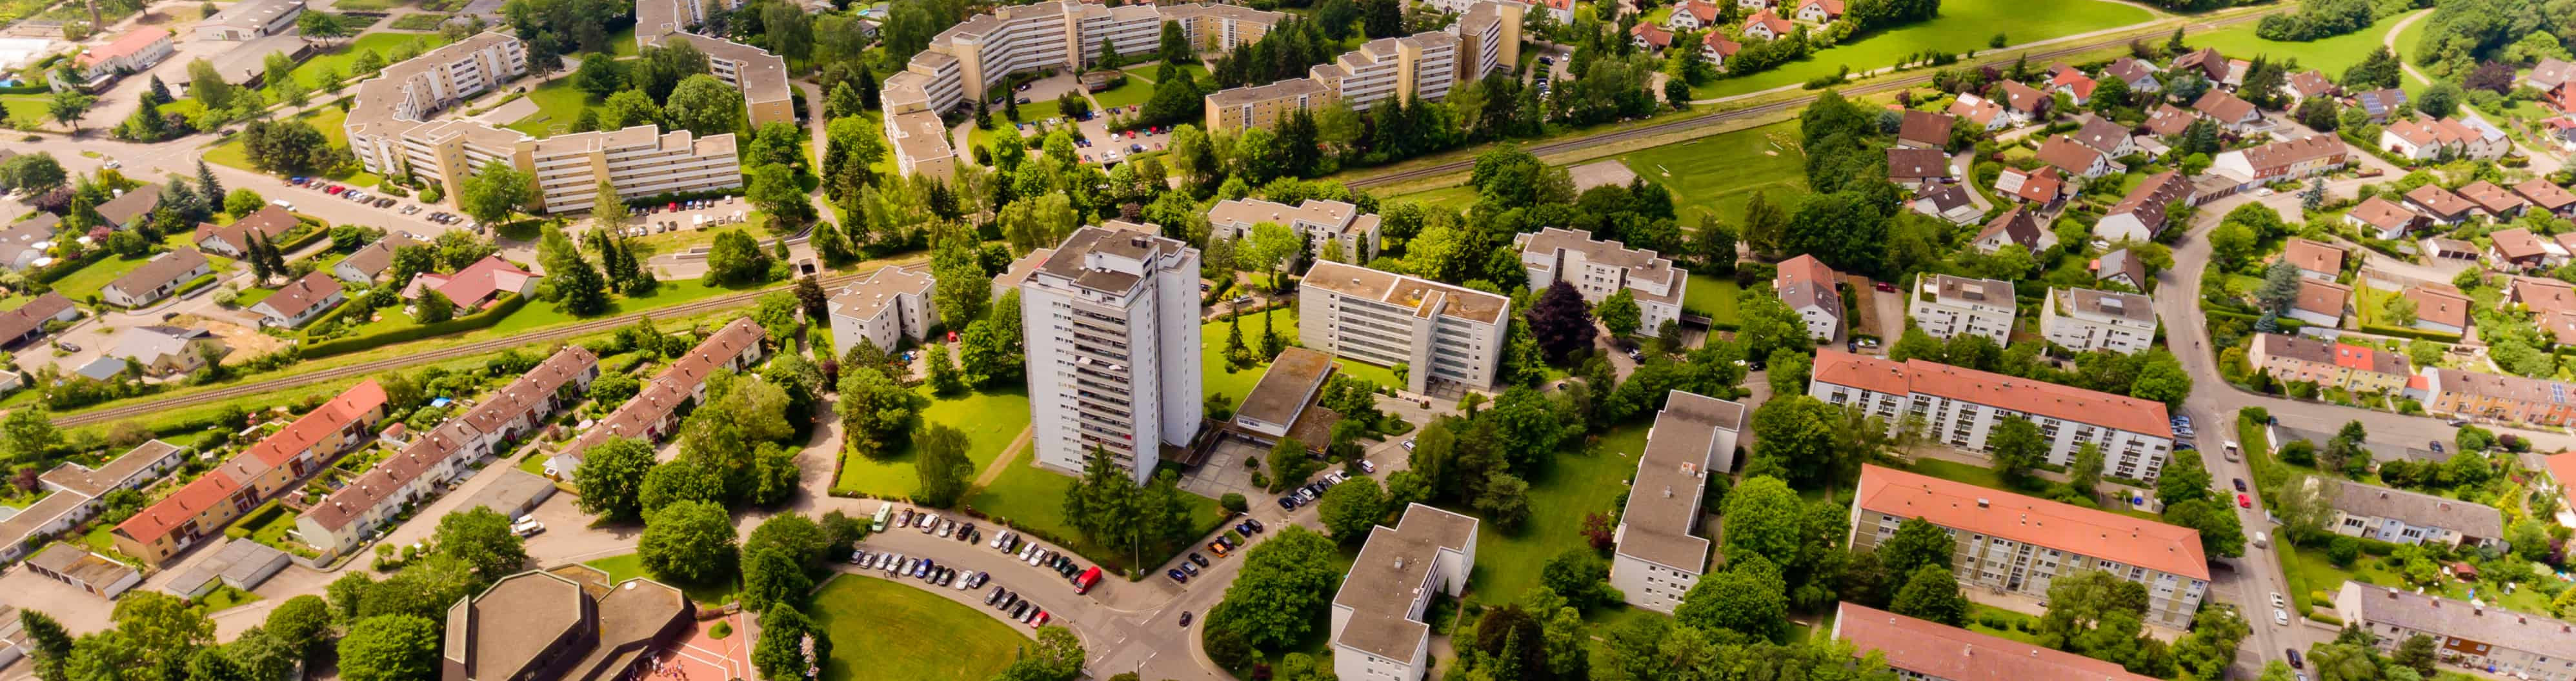 Small town – big adventures: SkyUp announces flights to Memmingen